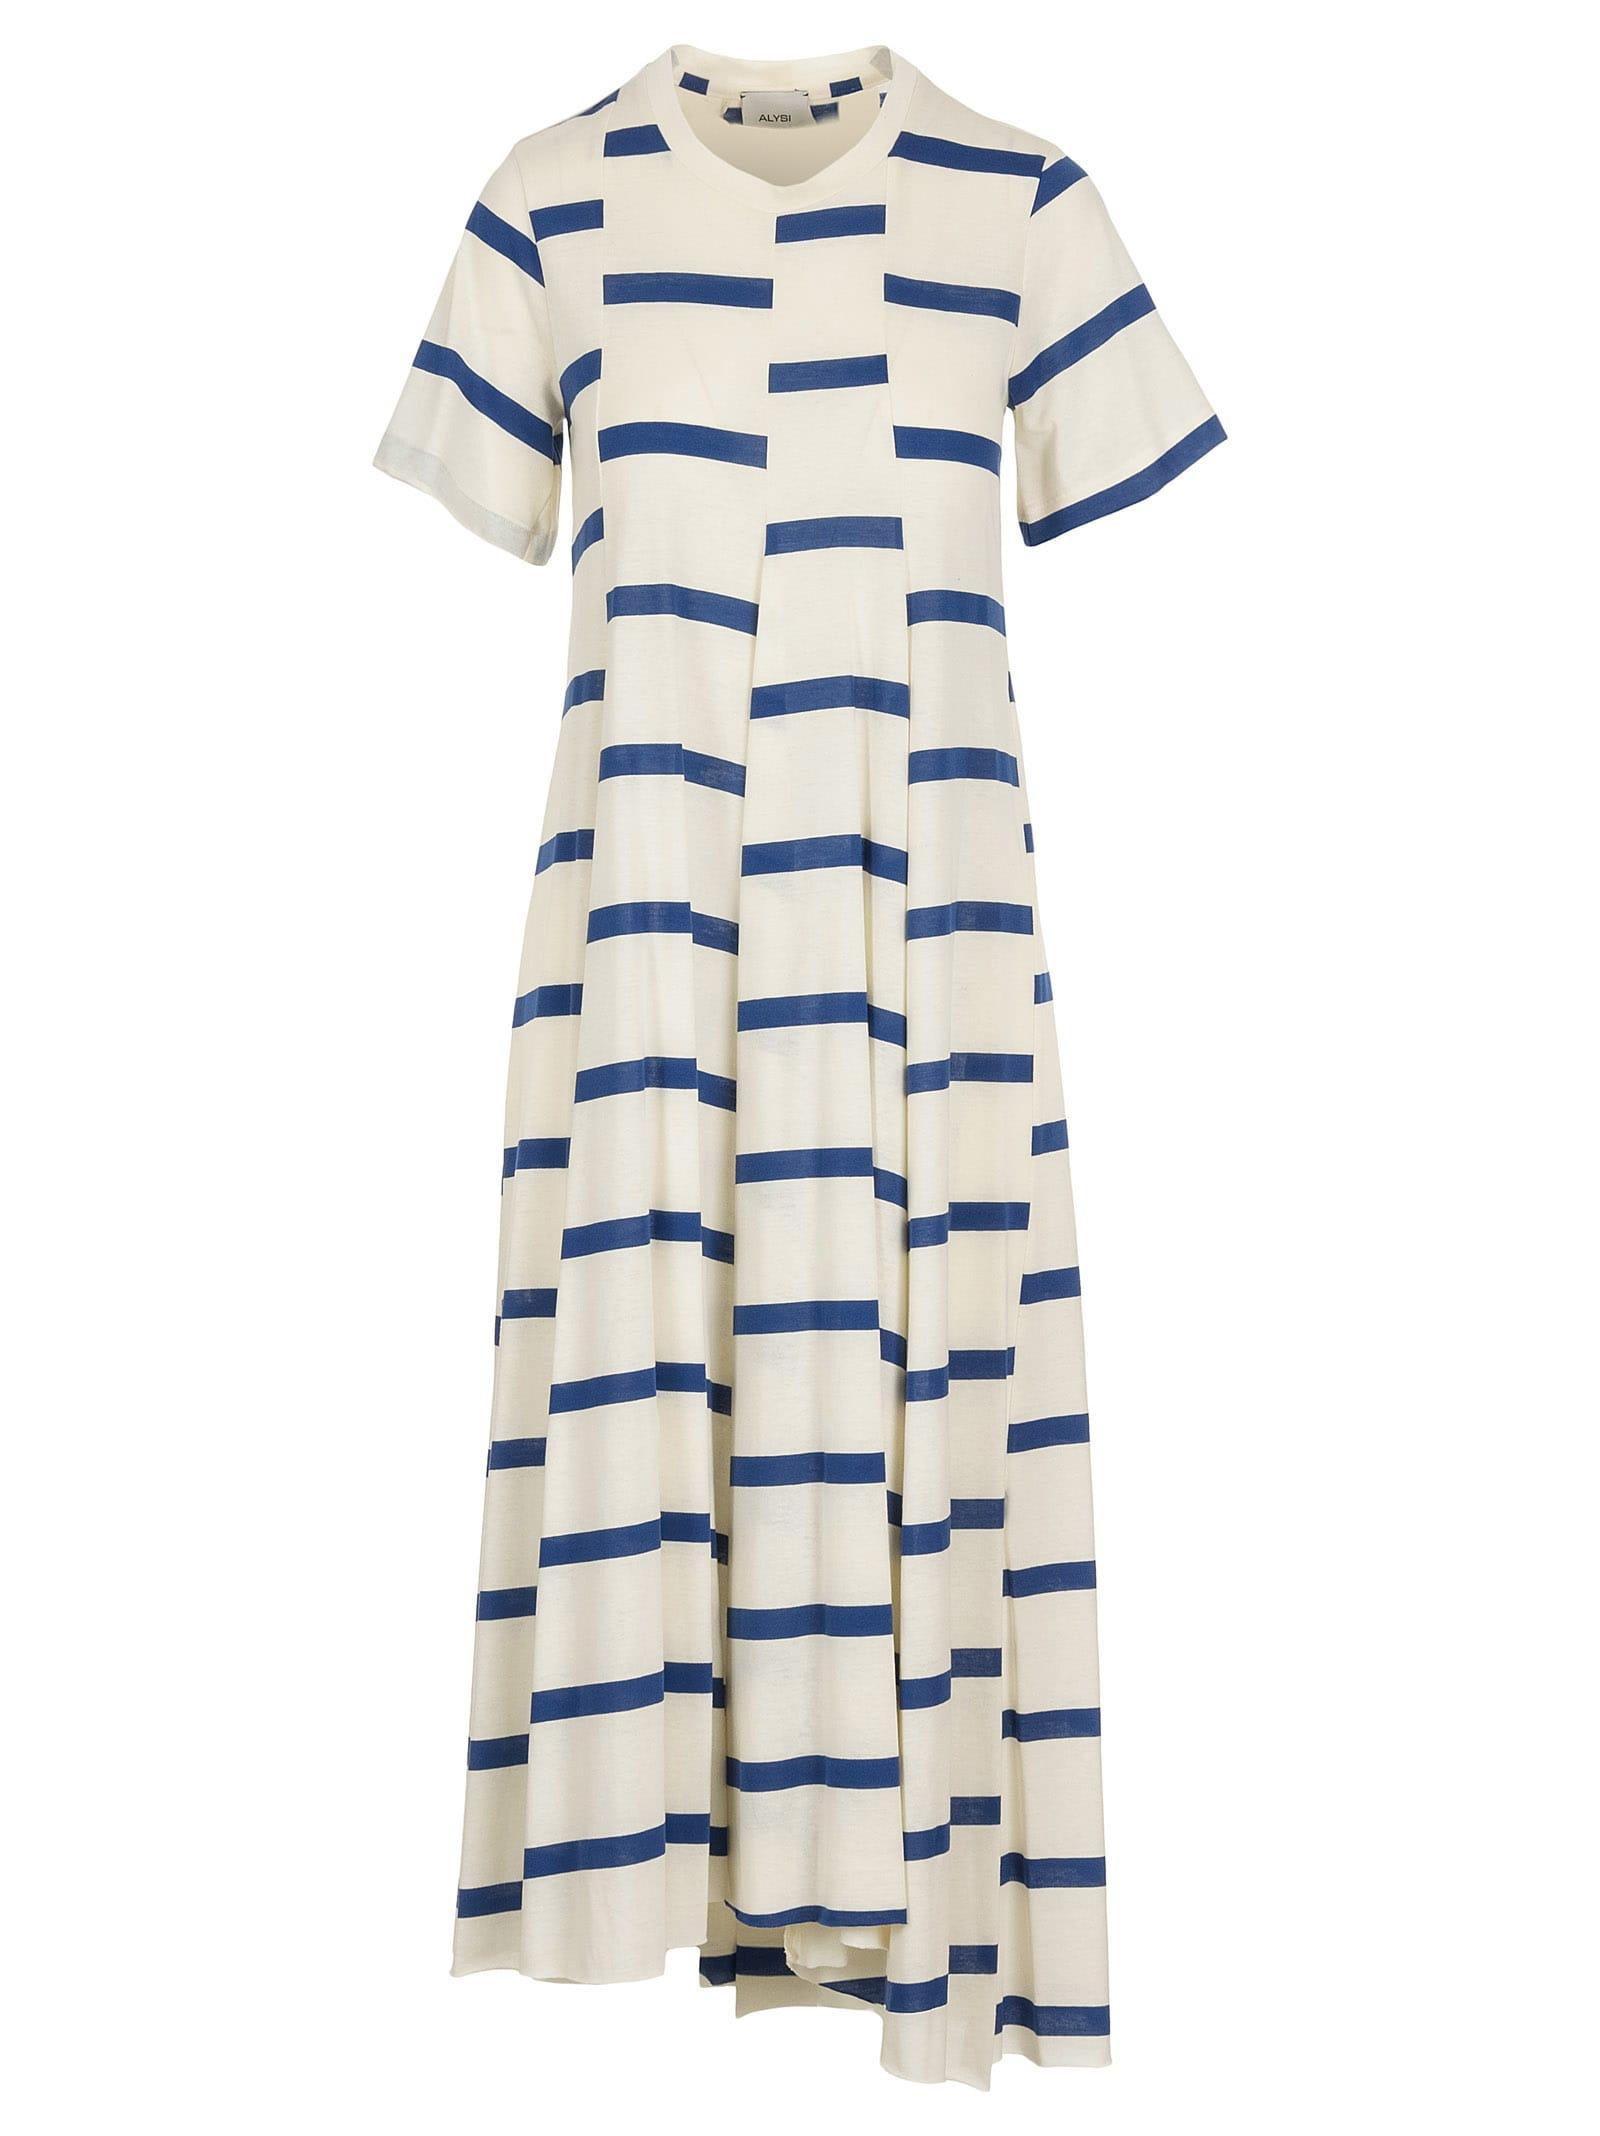 Alysi Cotton Dress